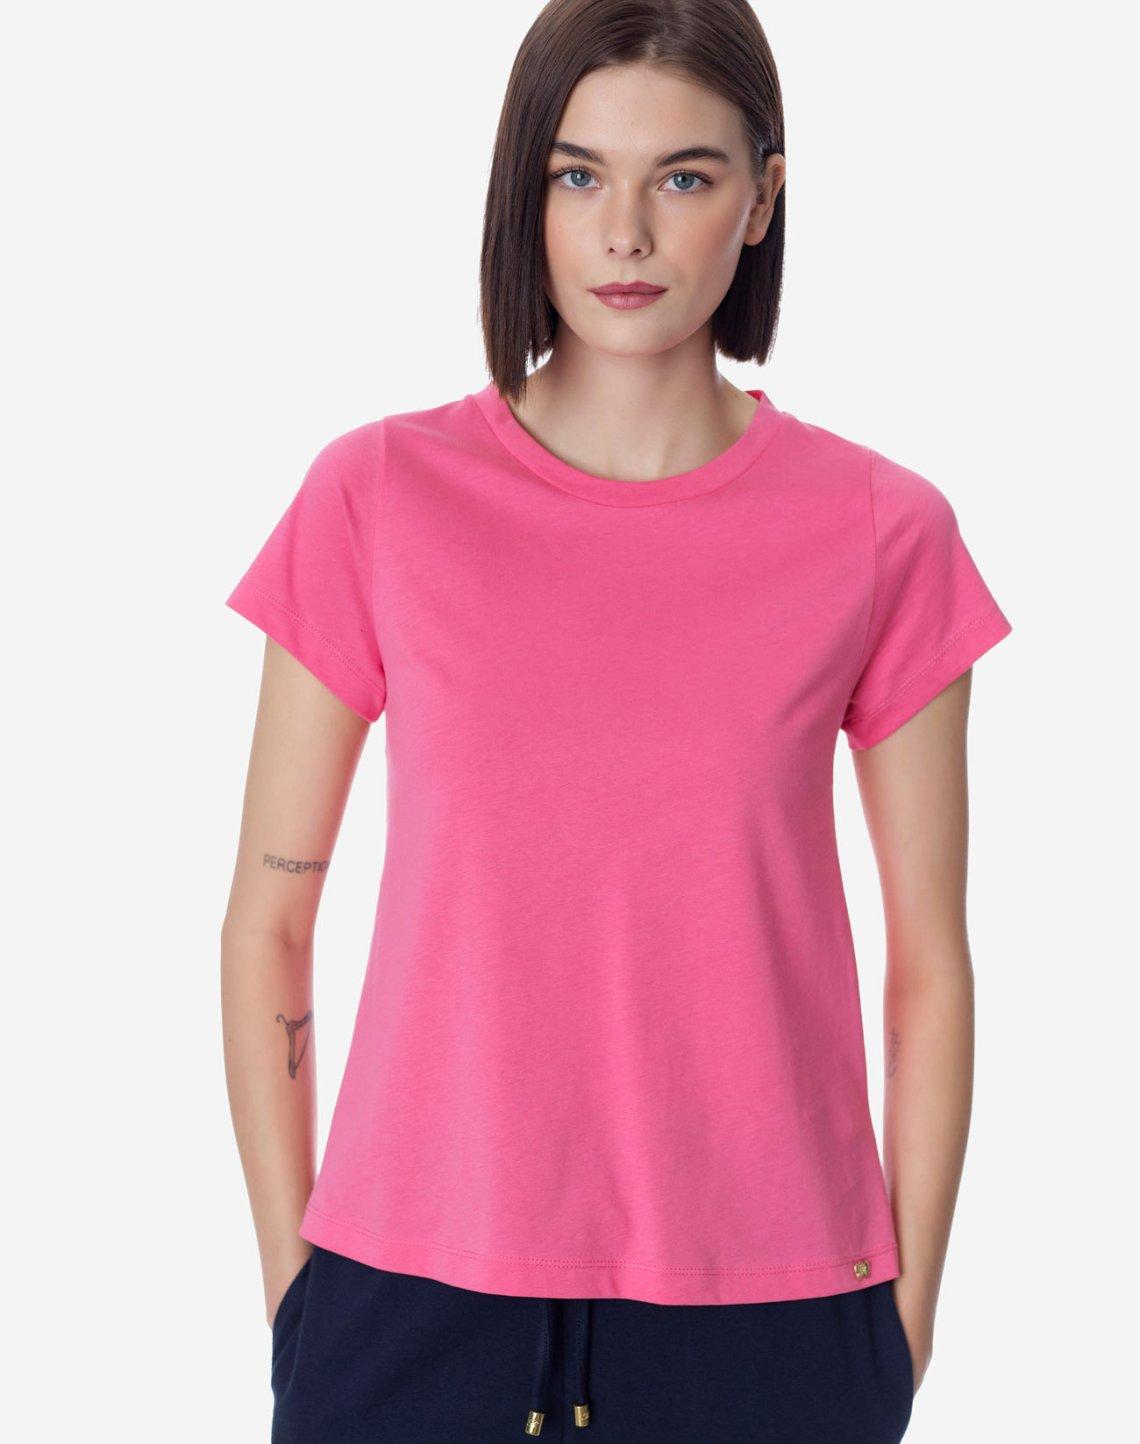 T-shirt οργανικό βαμβάκι